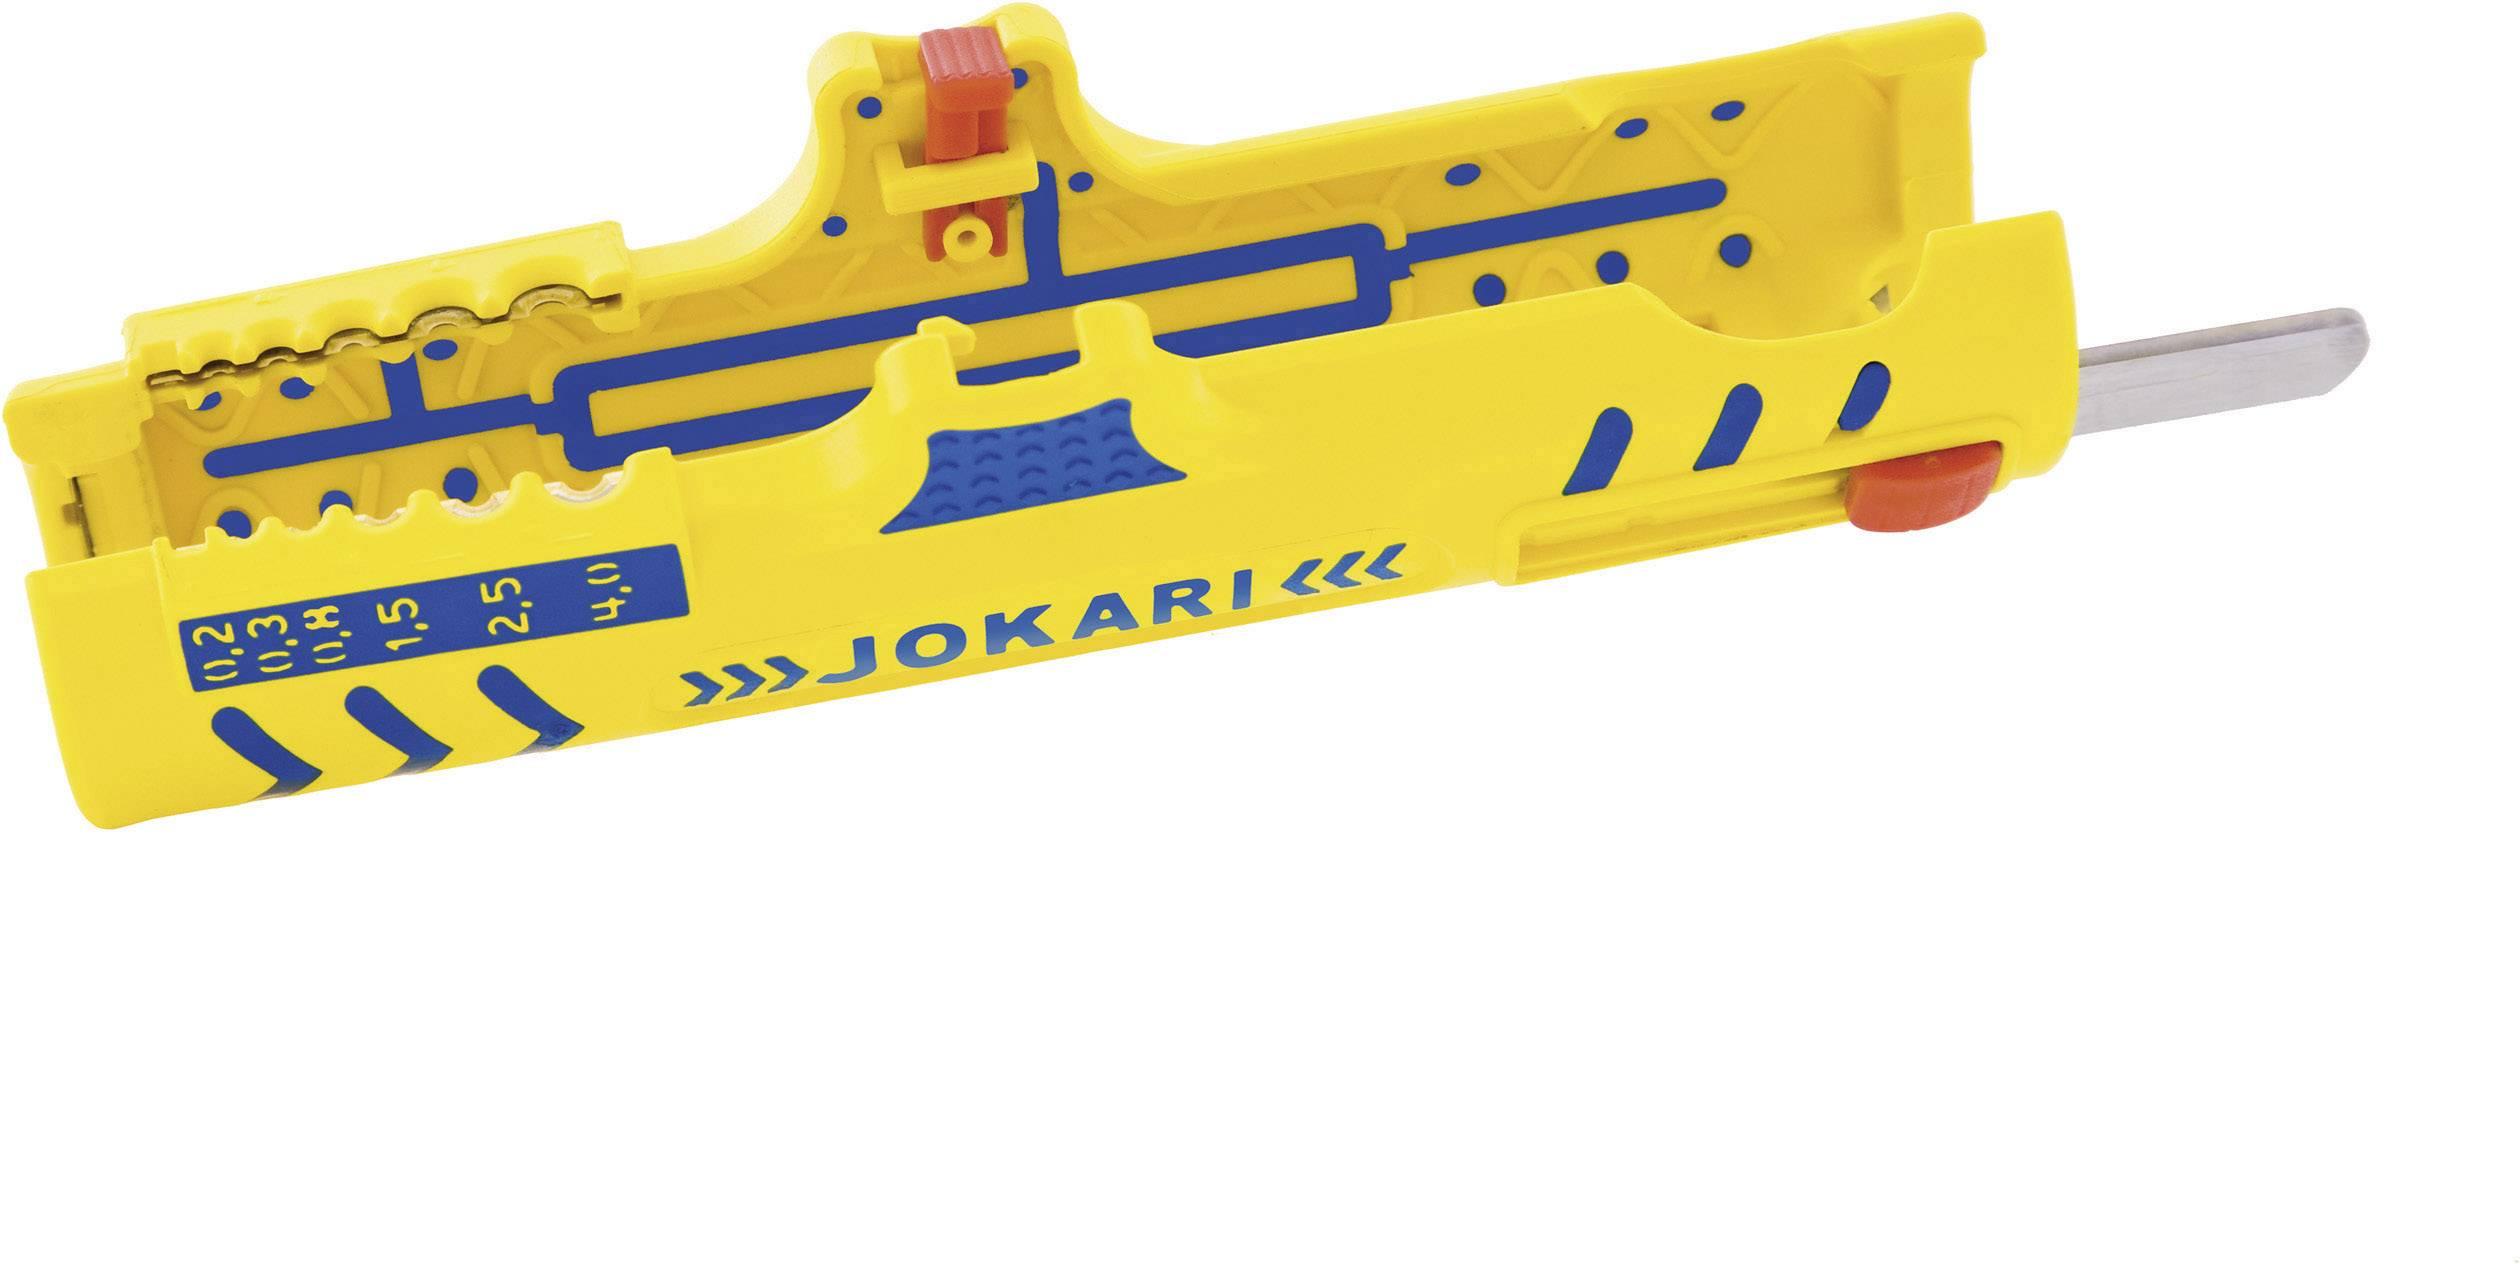 Odizolovač Jokari SECURA NO. 15 30155, 8 do 13 mm, 0.2 do 4 mm²